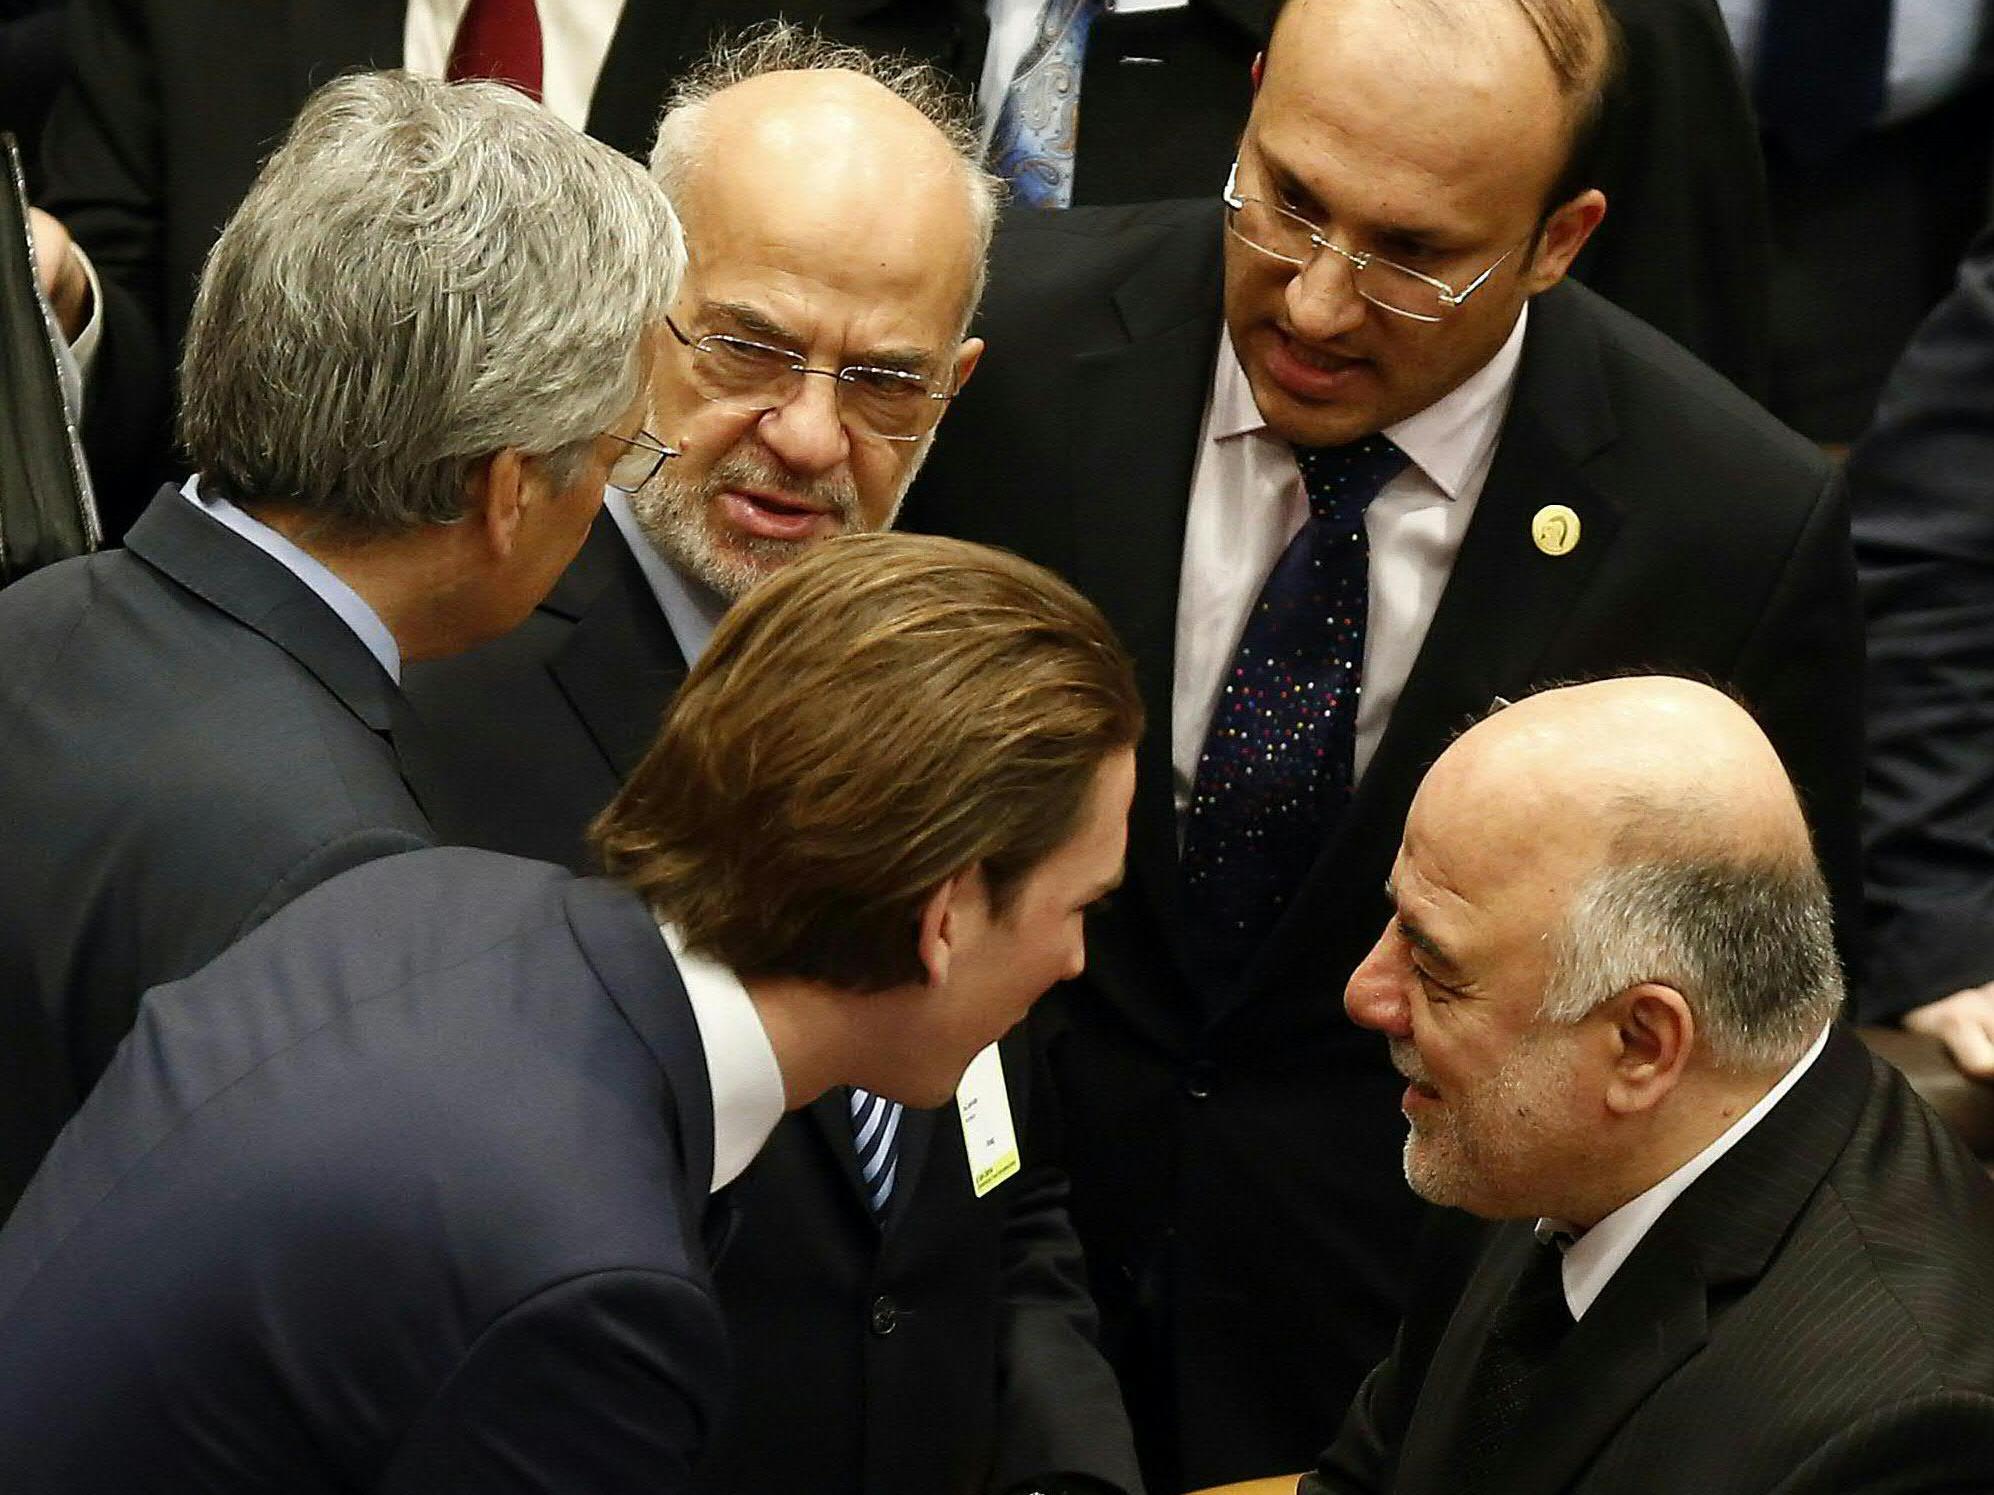 Auch Außenminister Sebastian Kurz nahm an dem Treffen teil.